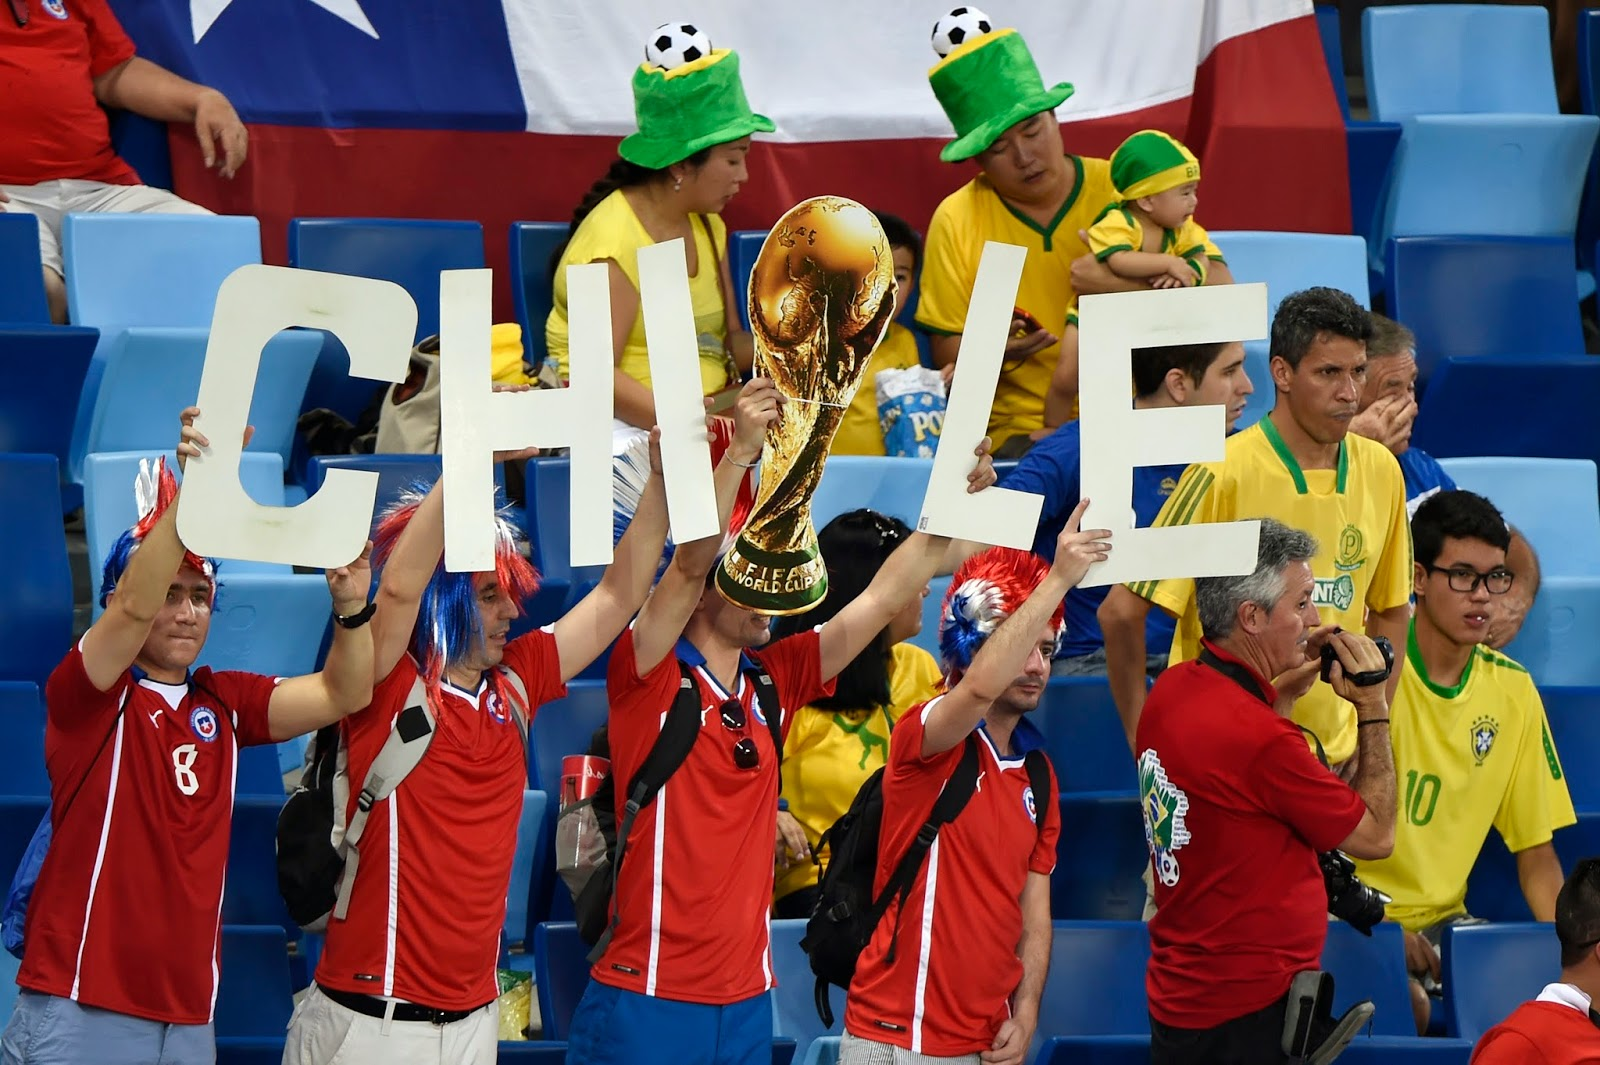 Australia Squad, Brazil, Chile Squad, Chile vs Australia, FIFA World Cup, FIFA World Cup 2014, Football, Football Fans, Sports, Group B, Tim Cahill, Claudio Bravo, Gary Medel, Mathew Leckie